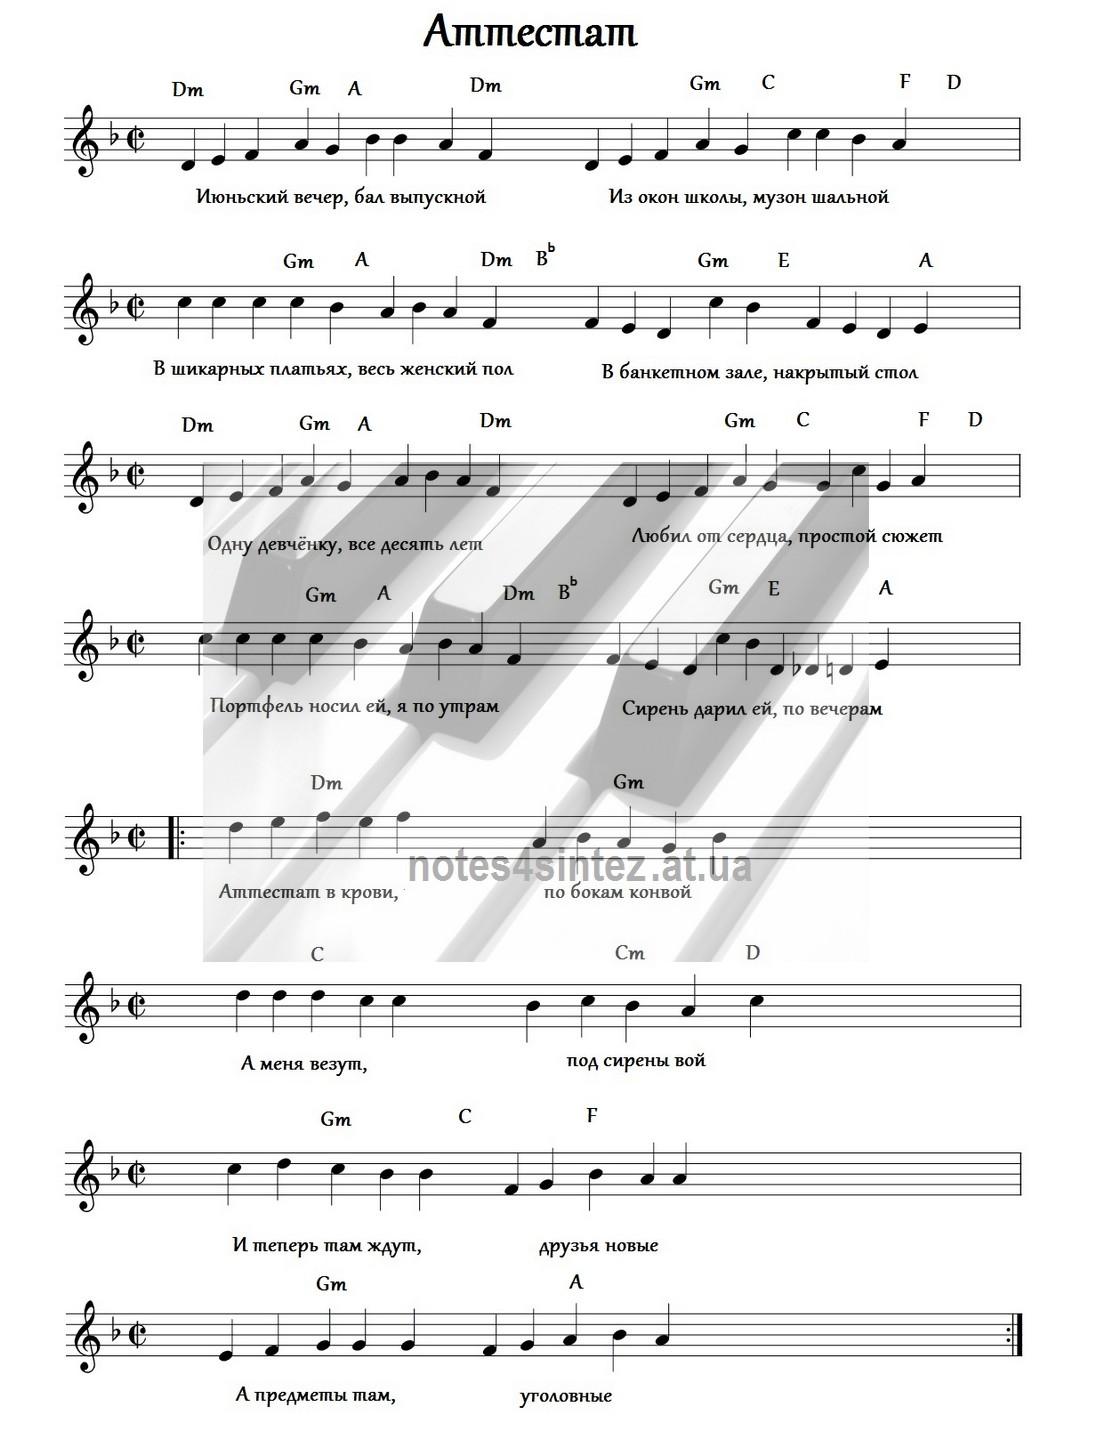 Аккордус  песенник с аккордами для гитары табулатуры